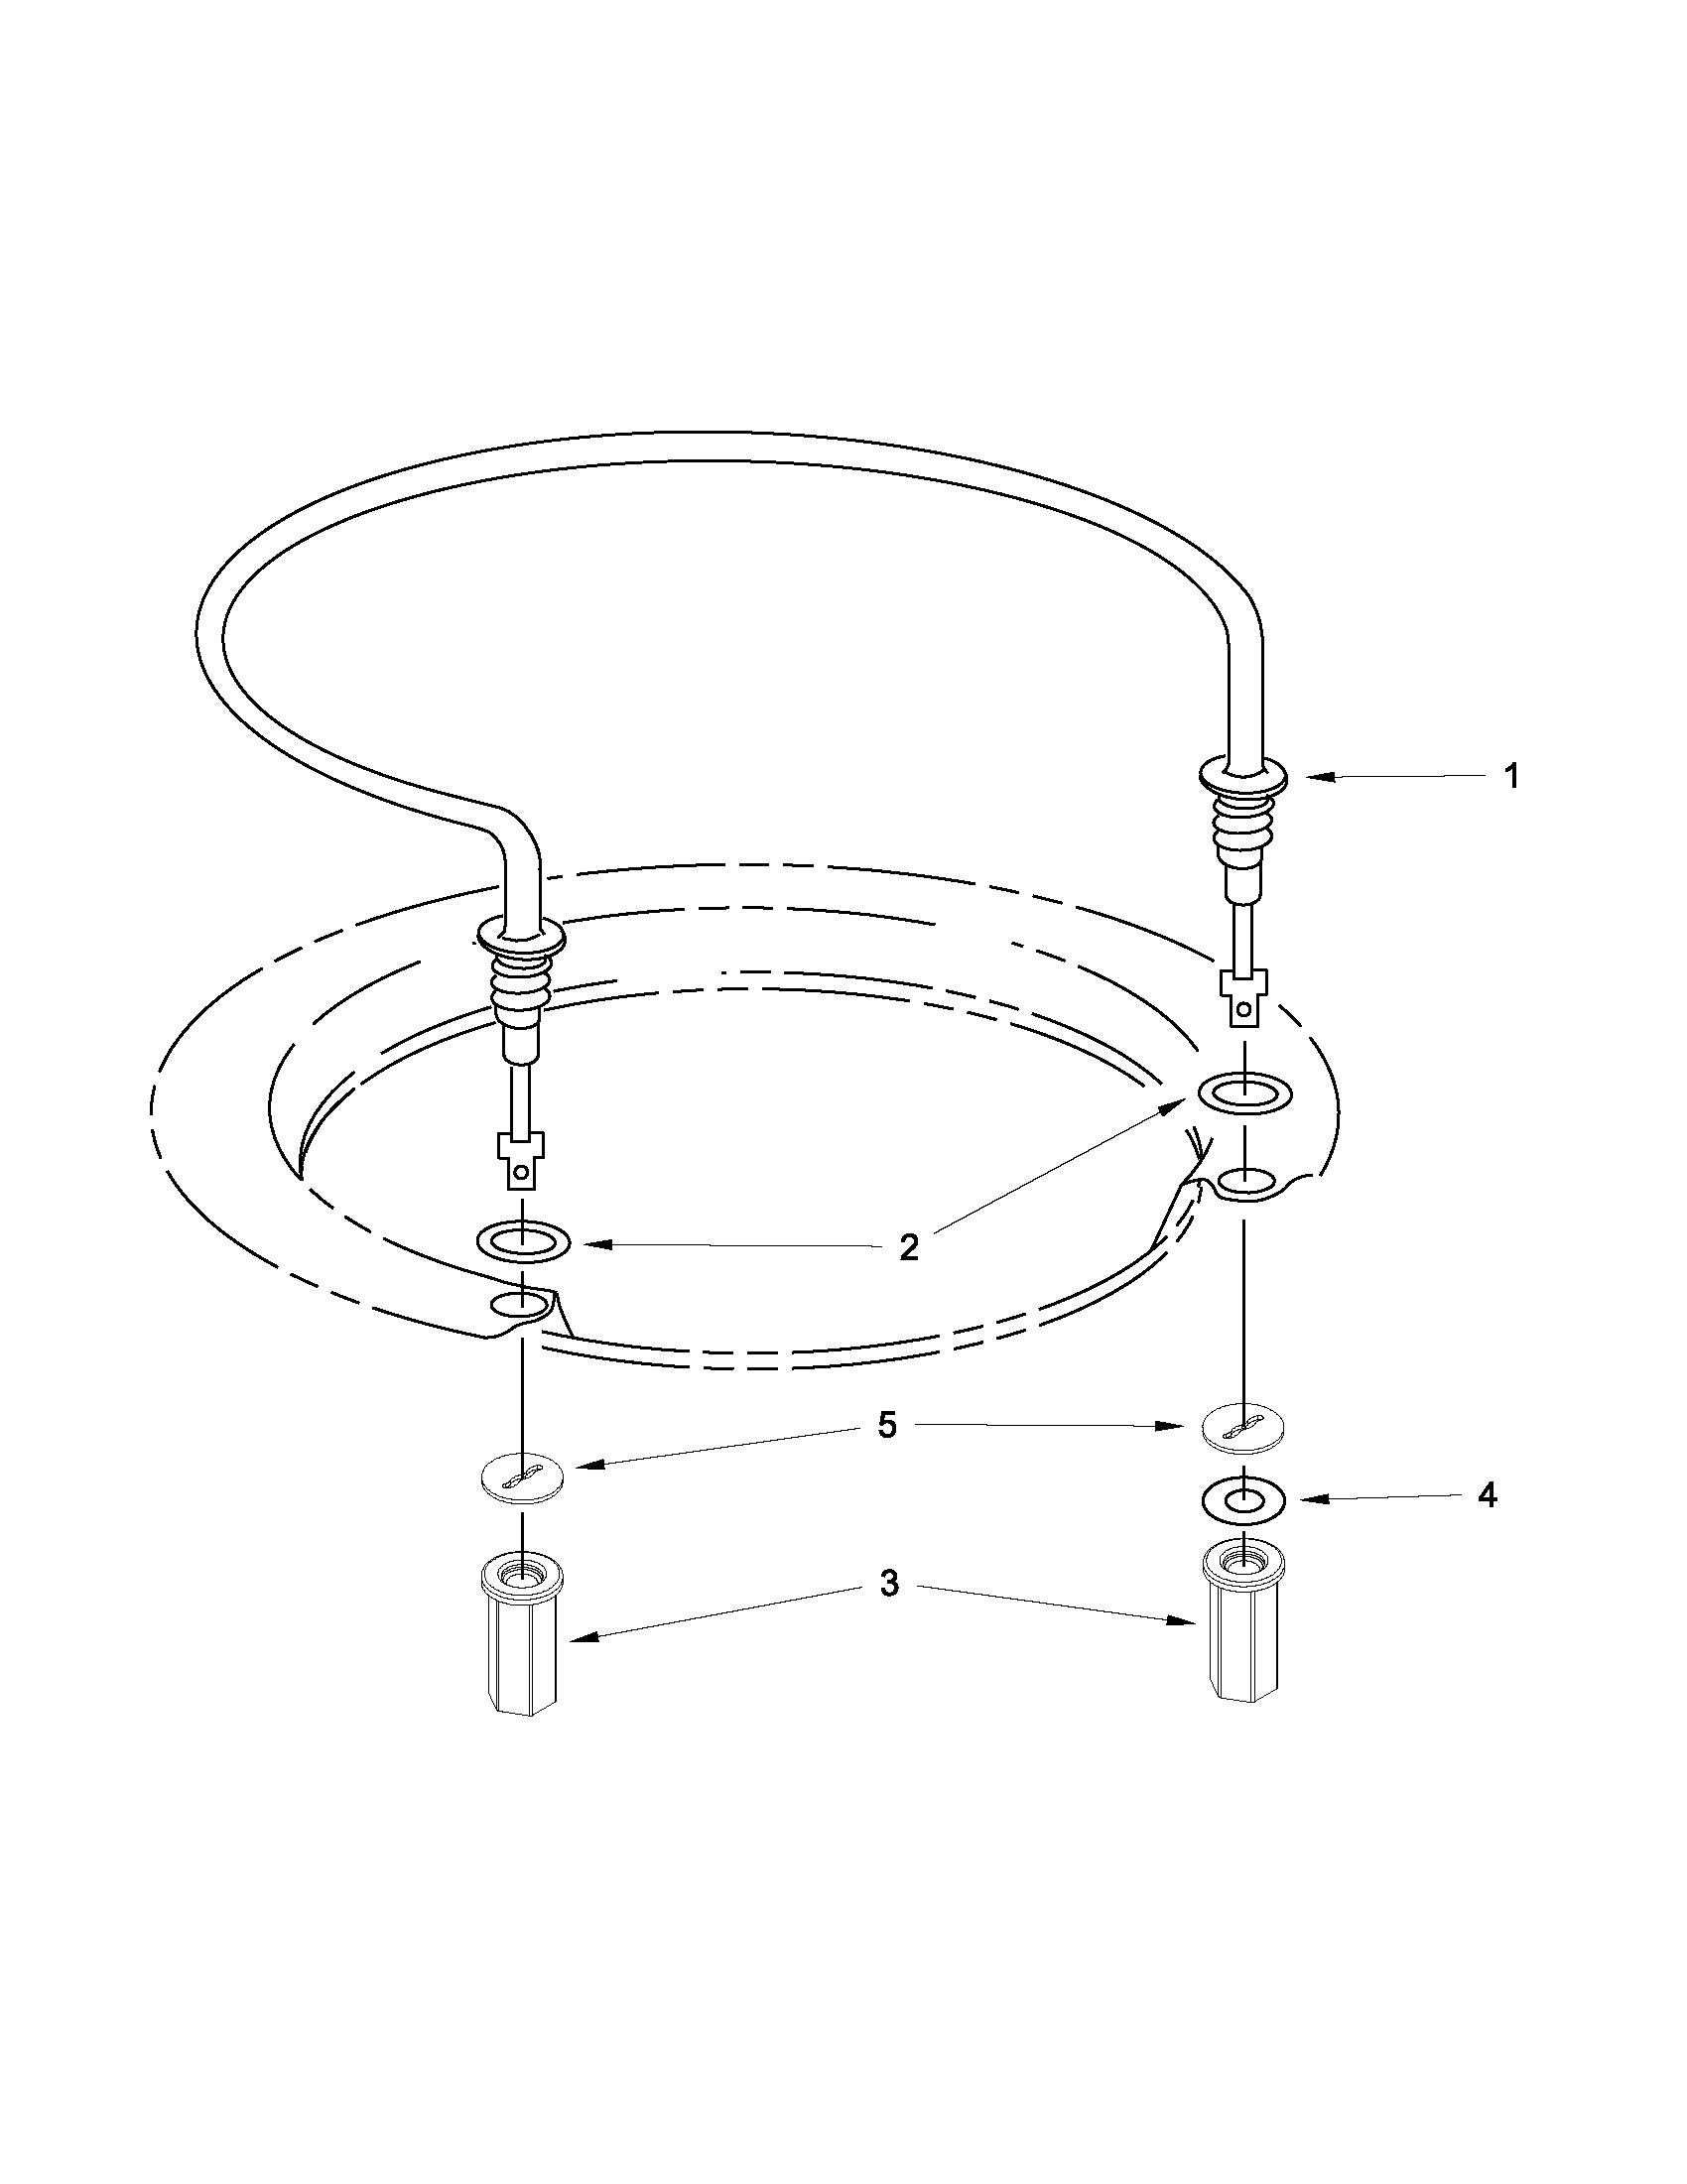 Maytag jetclean dishwasher filter